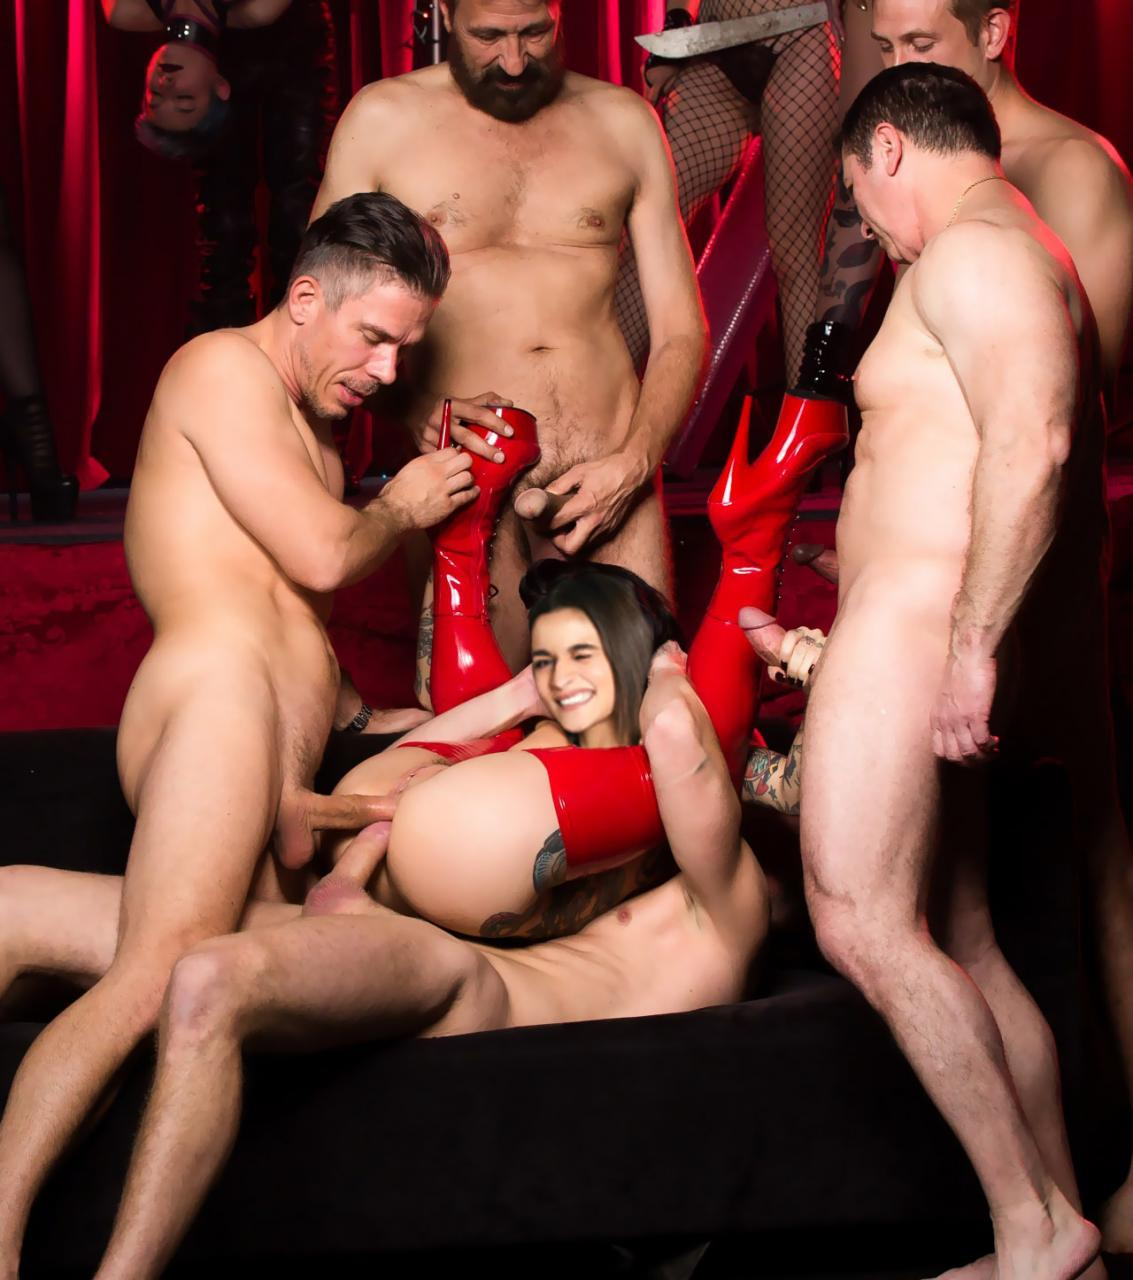 Alia Bhatt Nude Boobs and Pussy